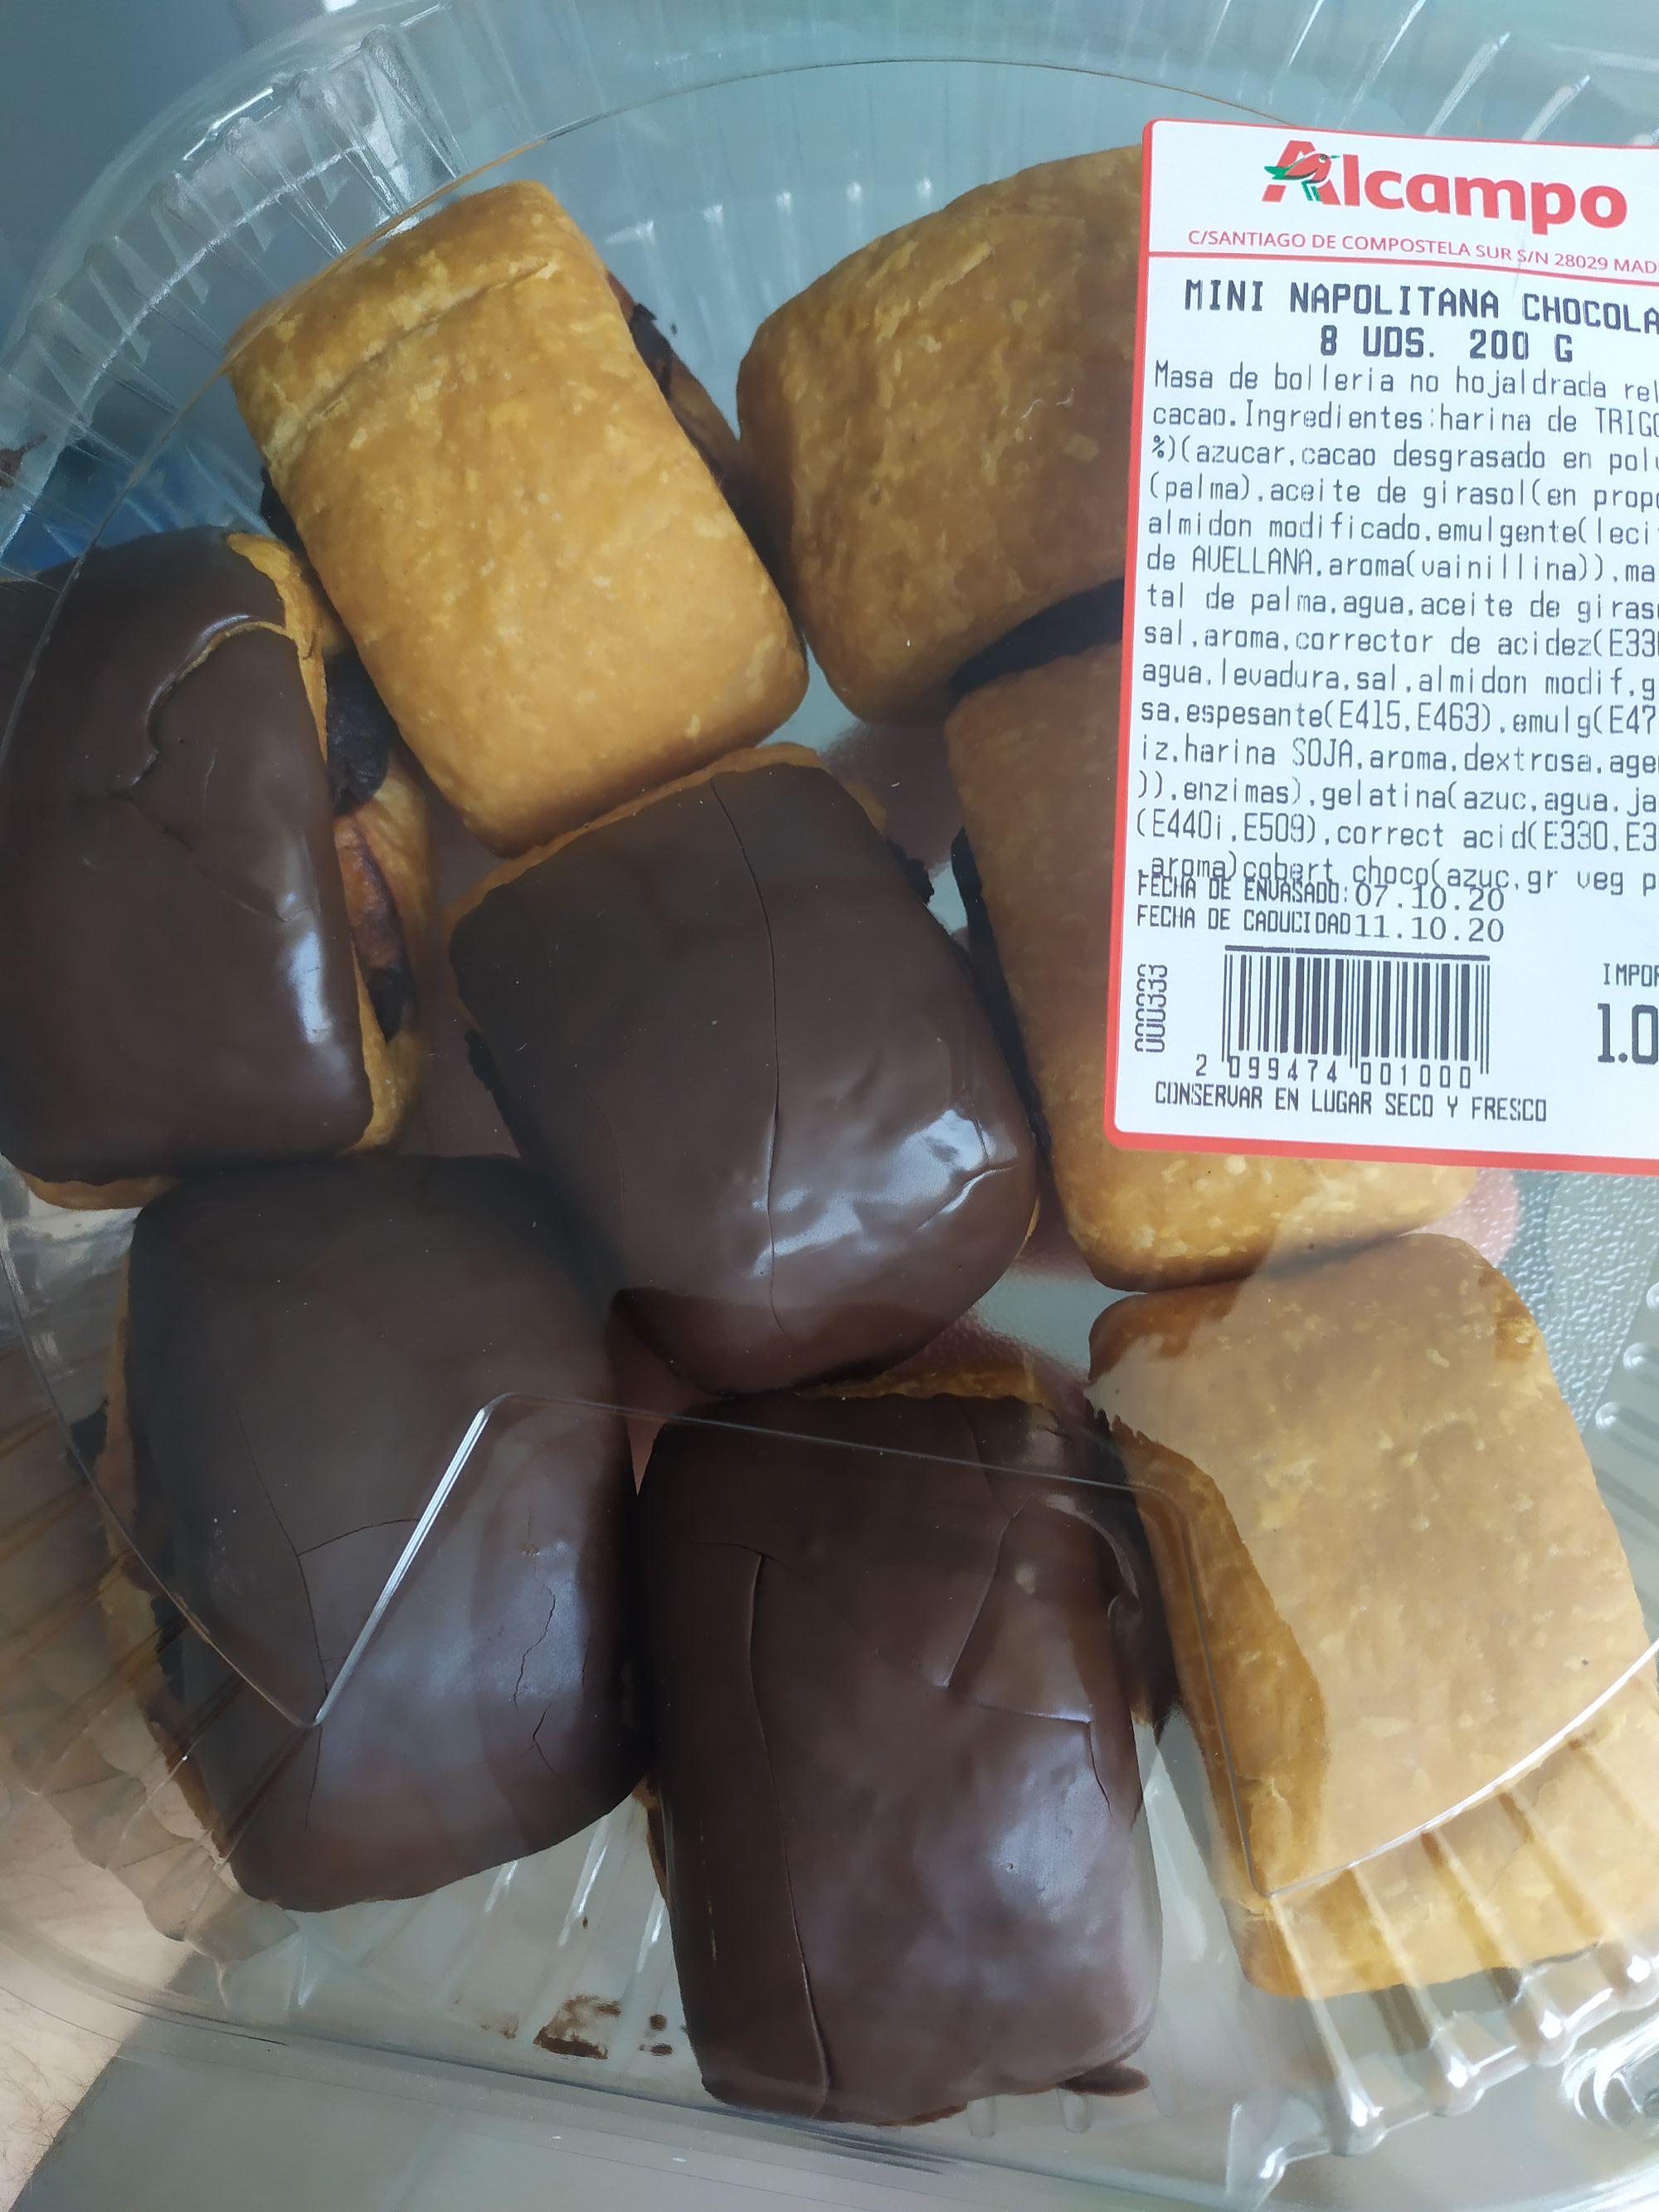 Mini napolitanas de chocolate 8 unidades 200g (Alcampo)